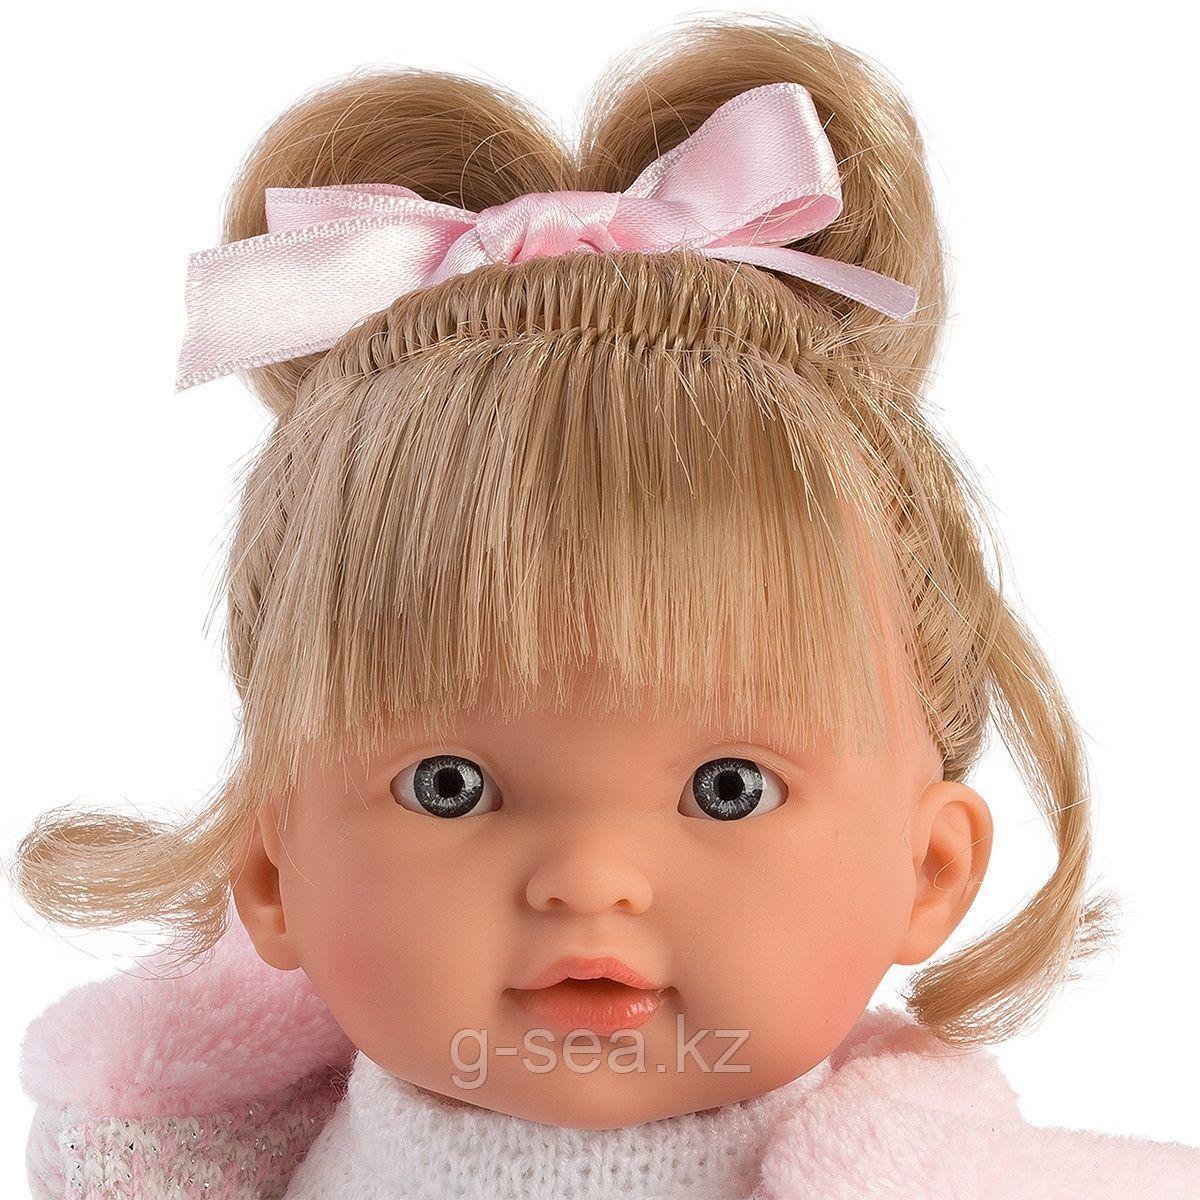 LLORENS: Кукла Валерия 28 см., блондинка в розовом костюме - фото 2